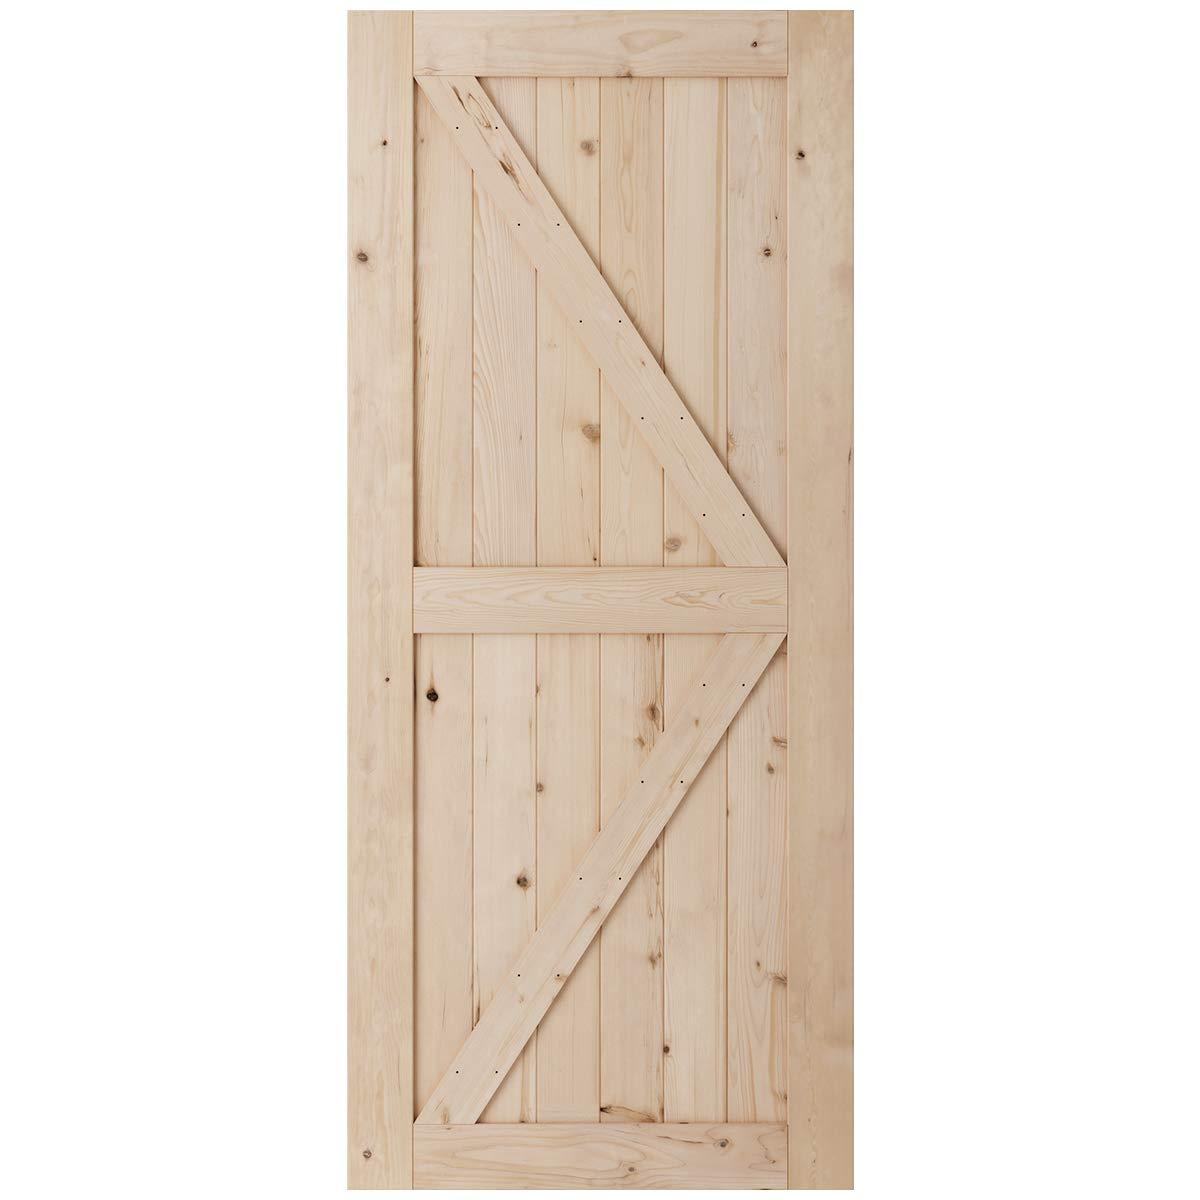 SmartStandard 36in x 84in Sliding Barn Wood Door Pre-Drilled Ready to Assemble, DIY Unfinished Solid Hemlock Wood Panelled Slab, Interior Single Door Only, Natural, K-Frame